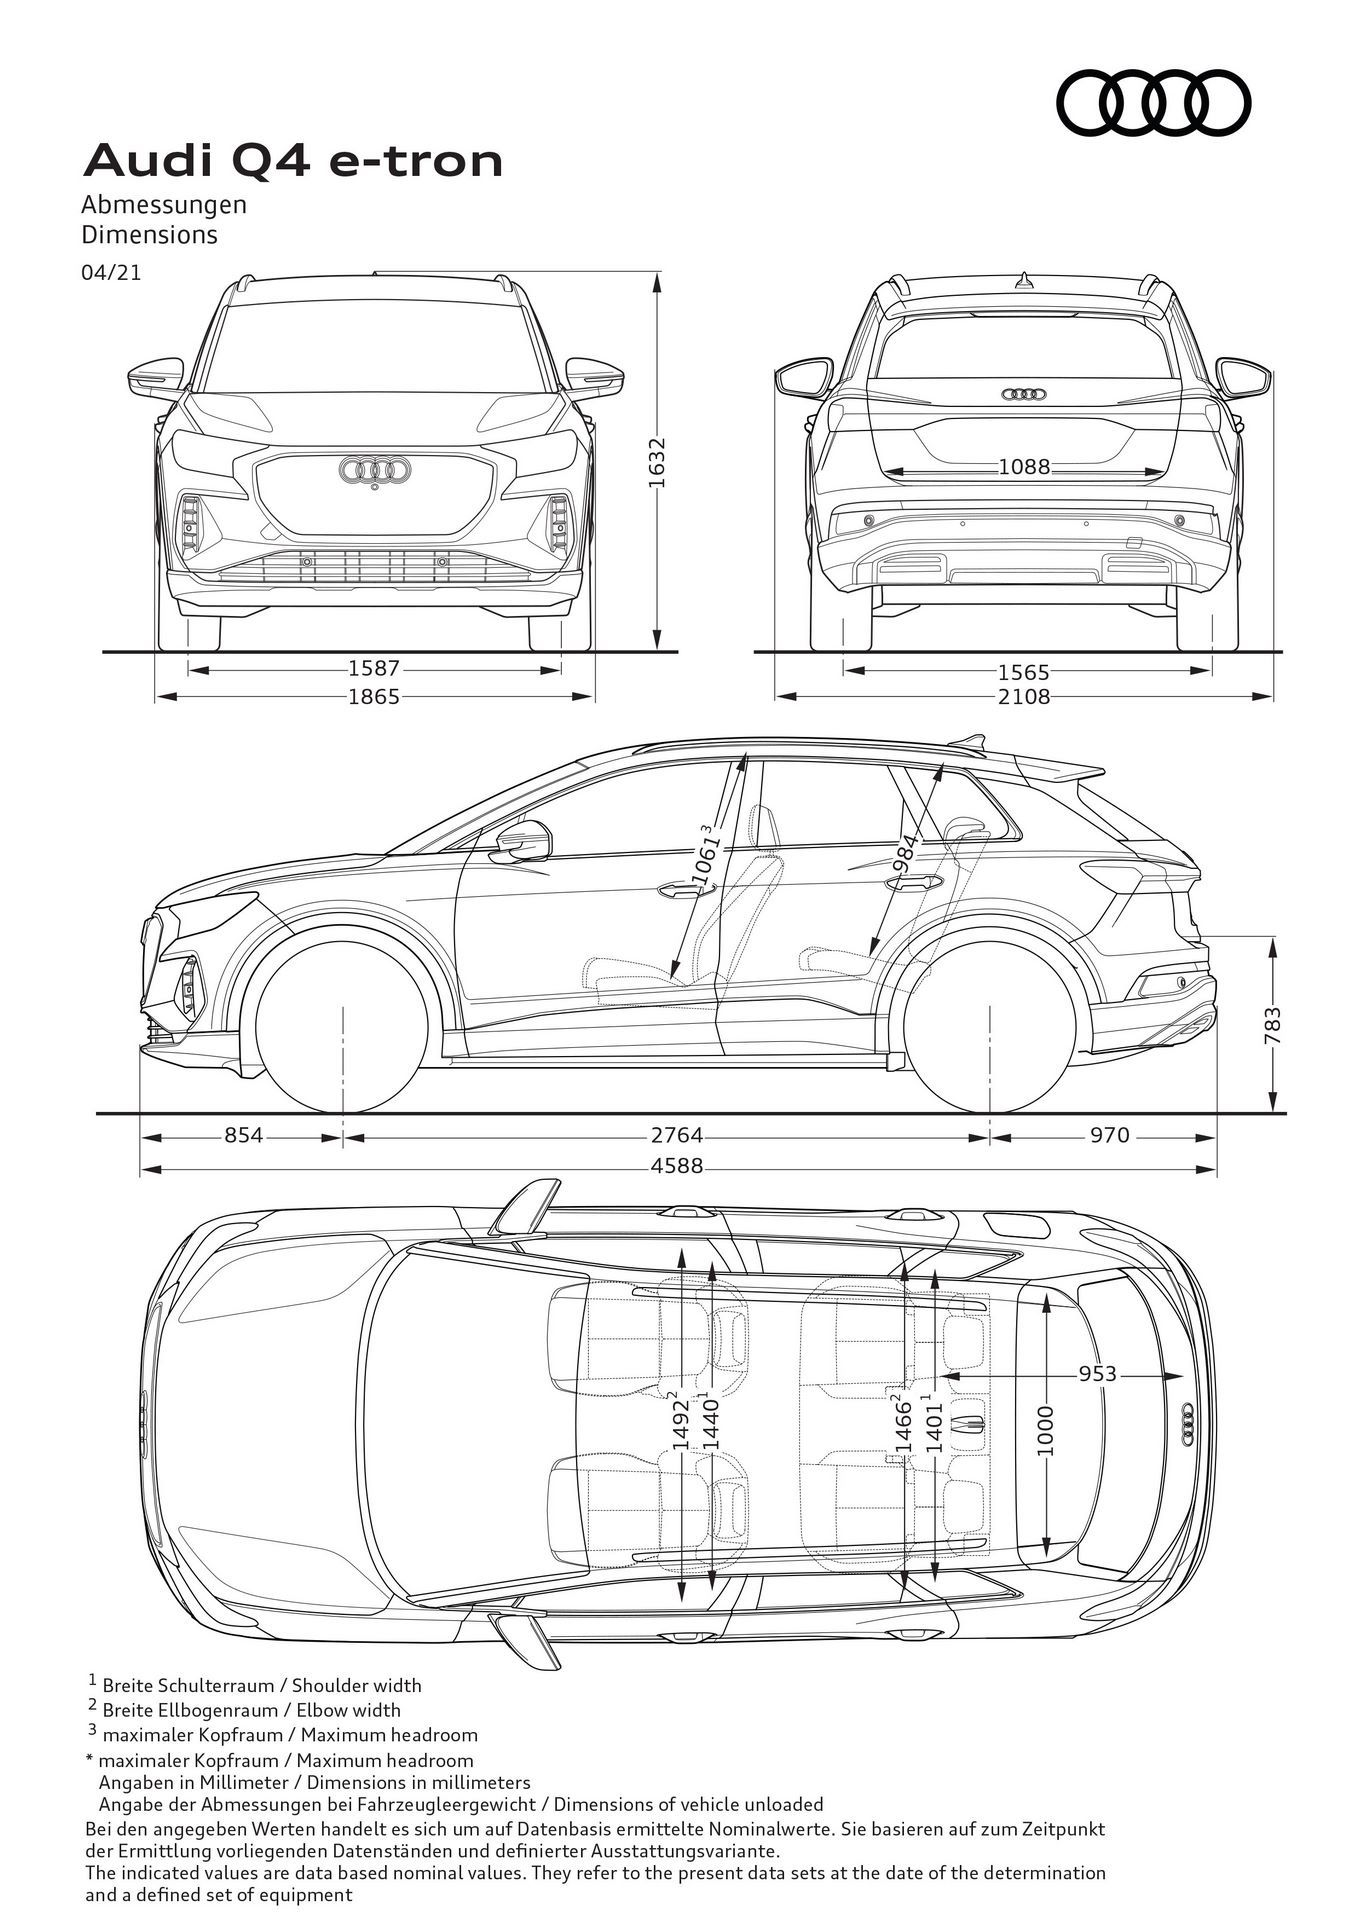 Audi-Q4-e-tron-and-Q4-e-tron-Sportback-97